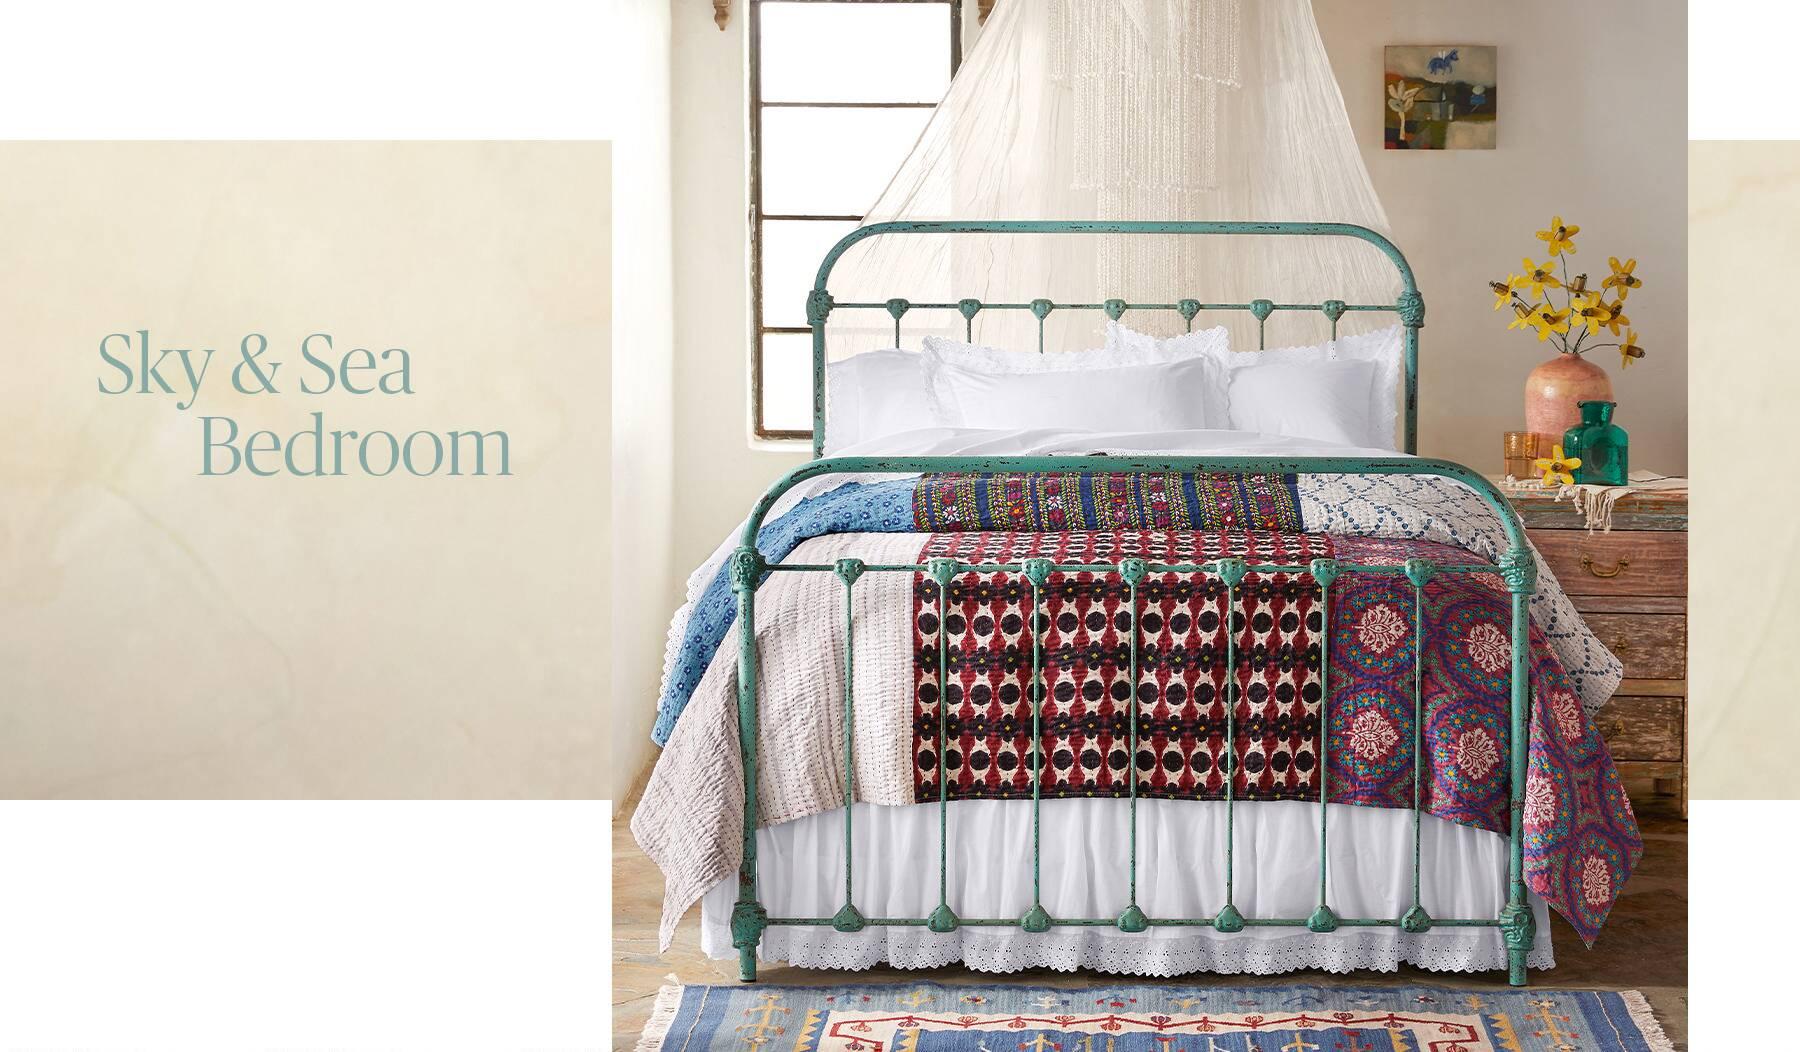 Sky & Sea Bedroom